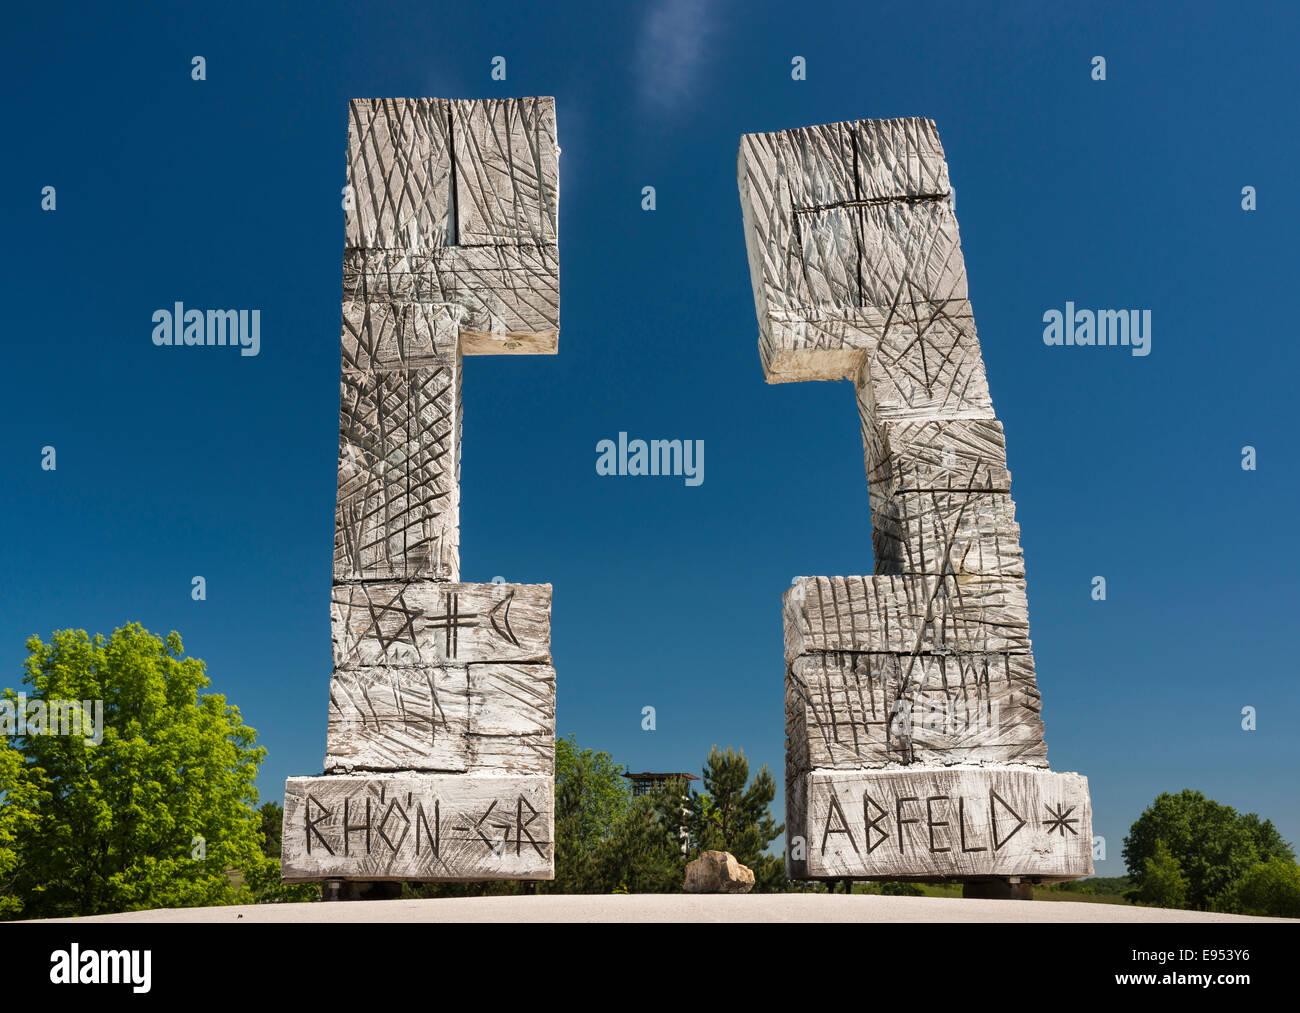 Instalación 'transversal abierta - una frontera superar', 2010, el artista Gernot Ehrsam, Skulpturenpark Imagen De Stock